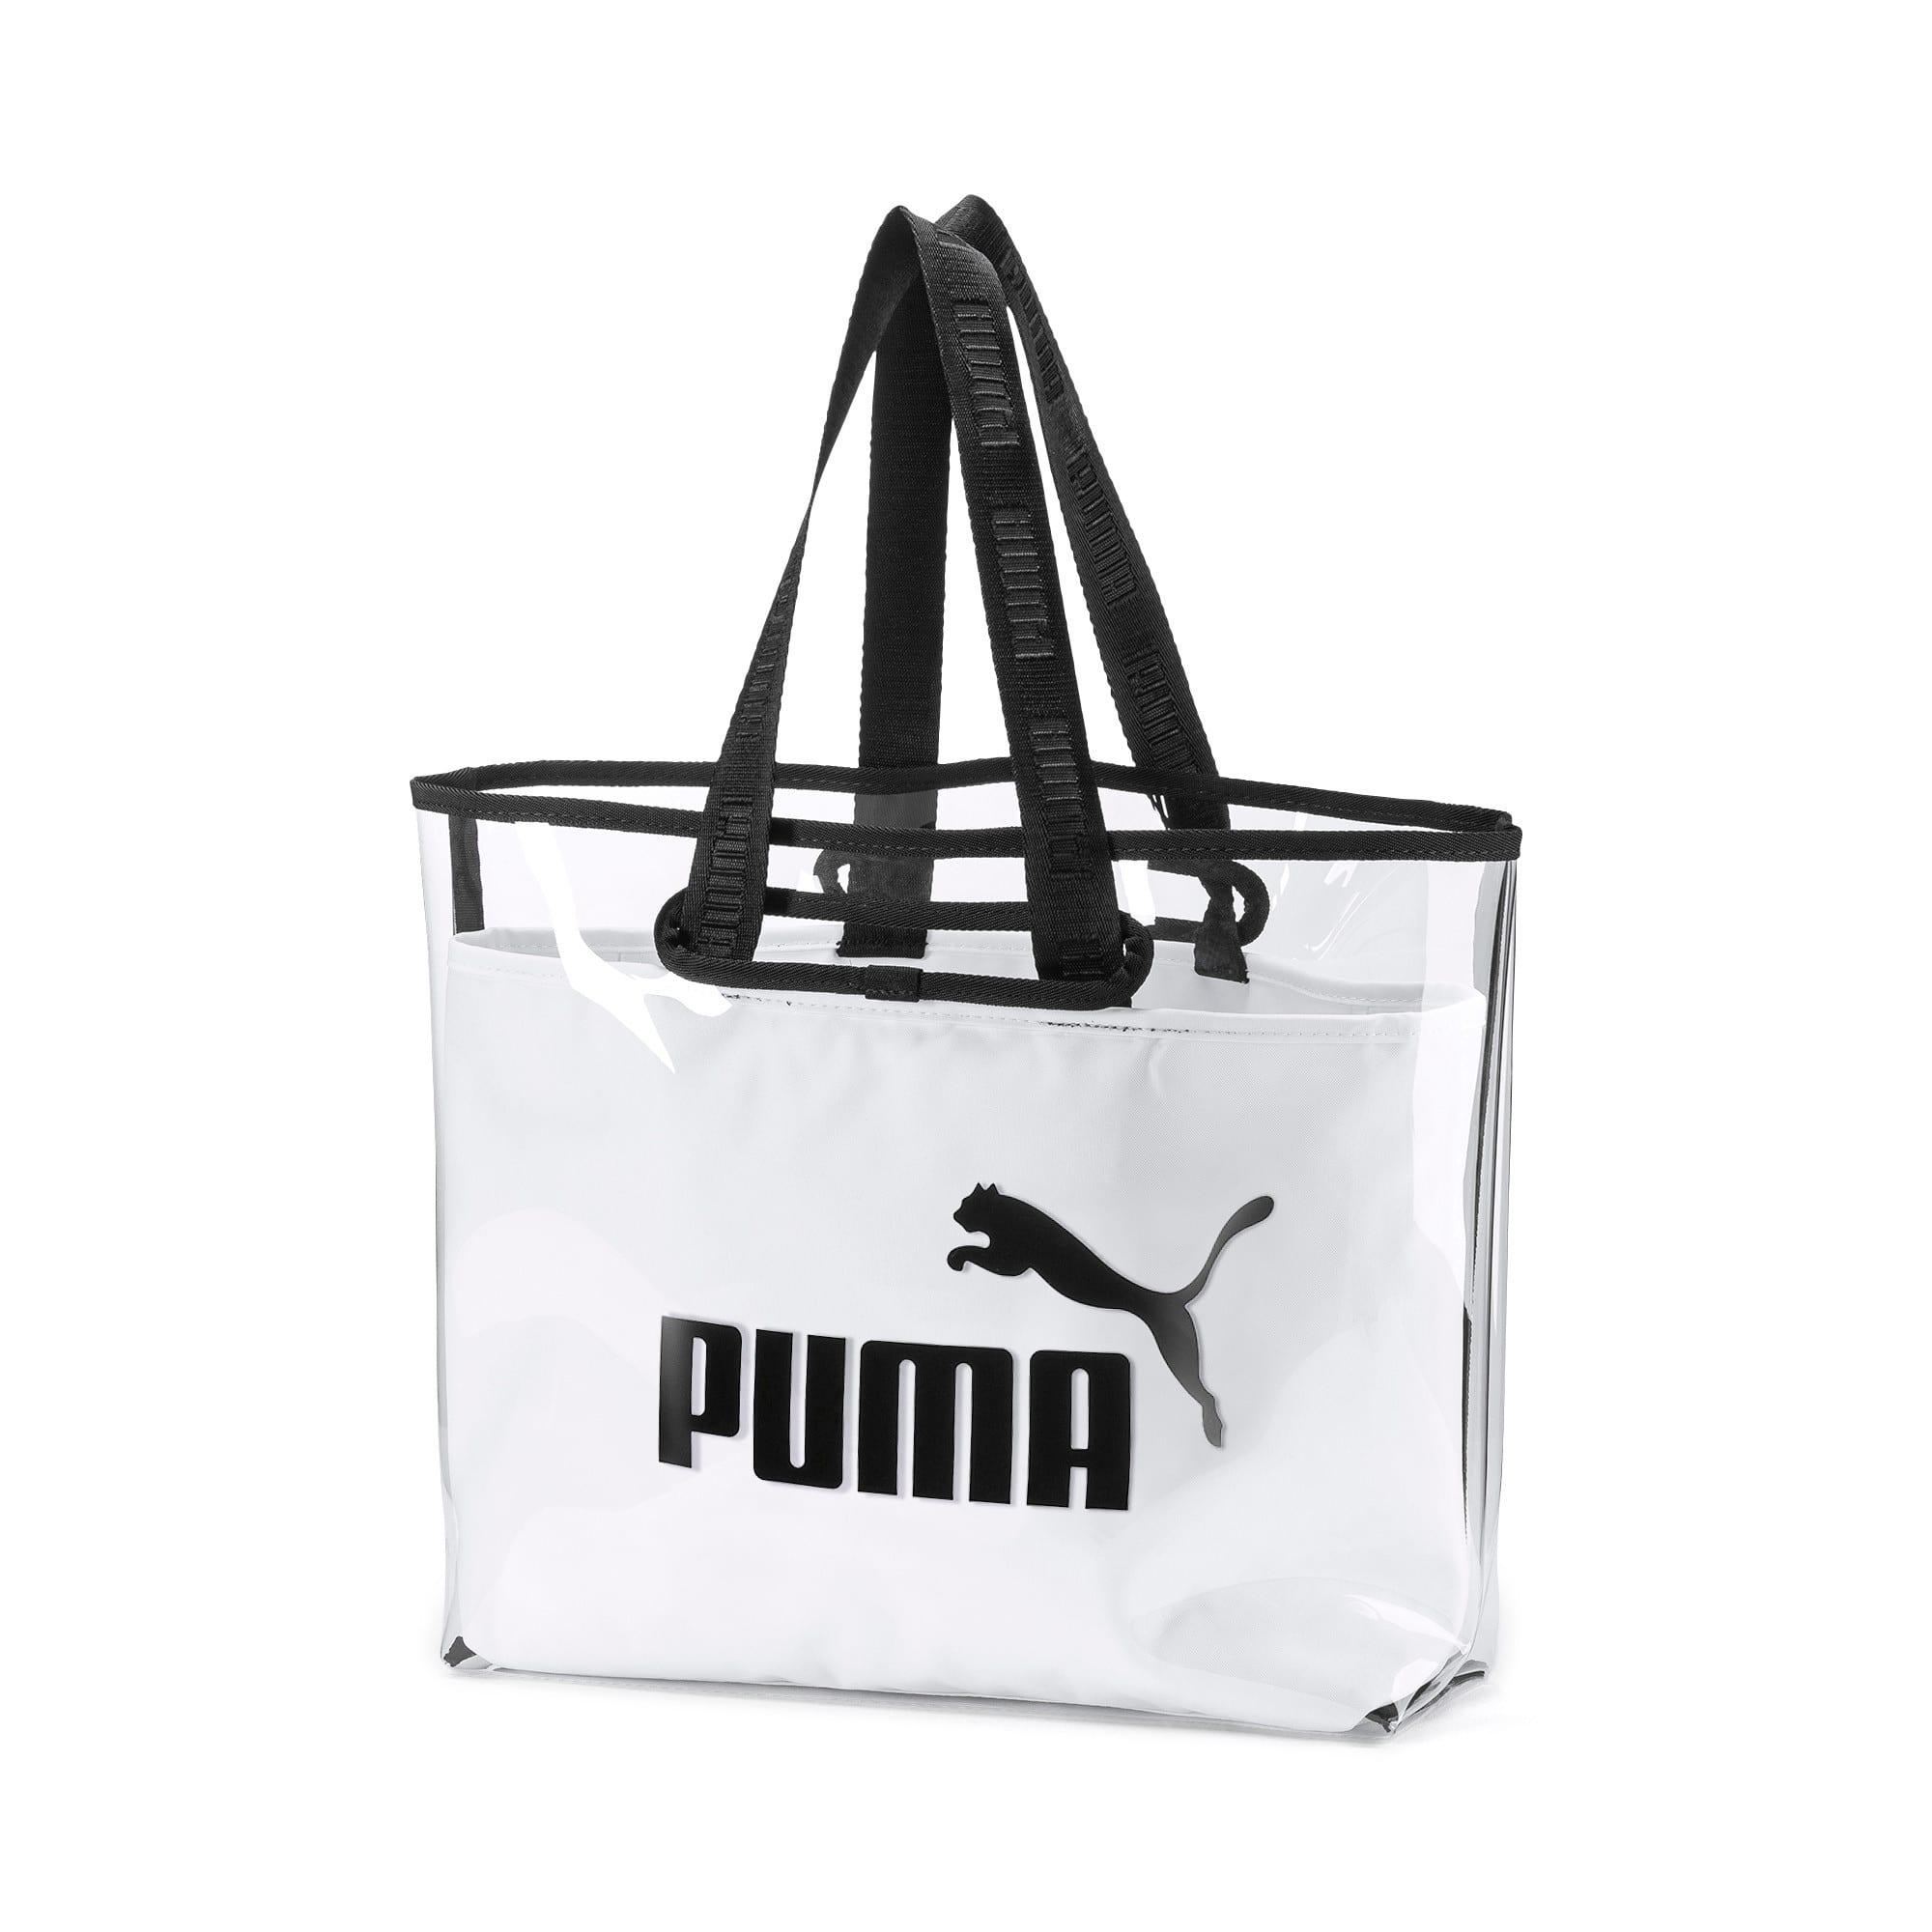 Thumbnail 1 of Damen Twin Shopper, Puma White, medium